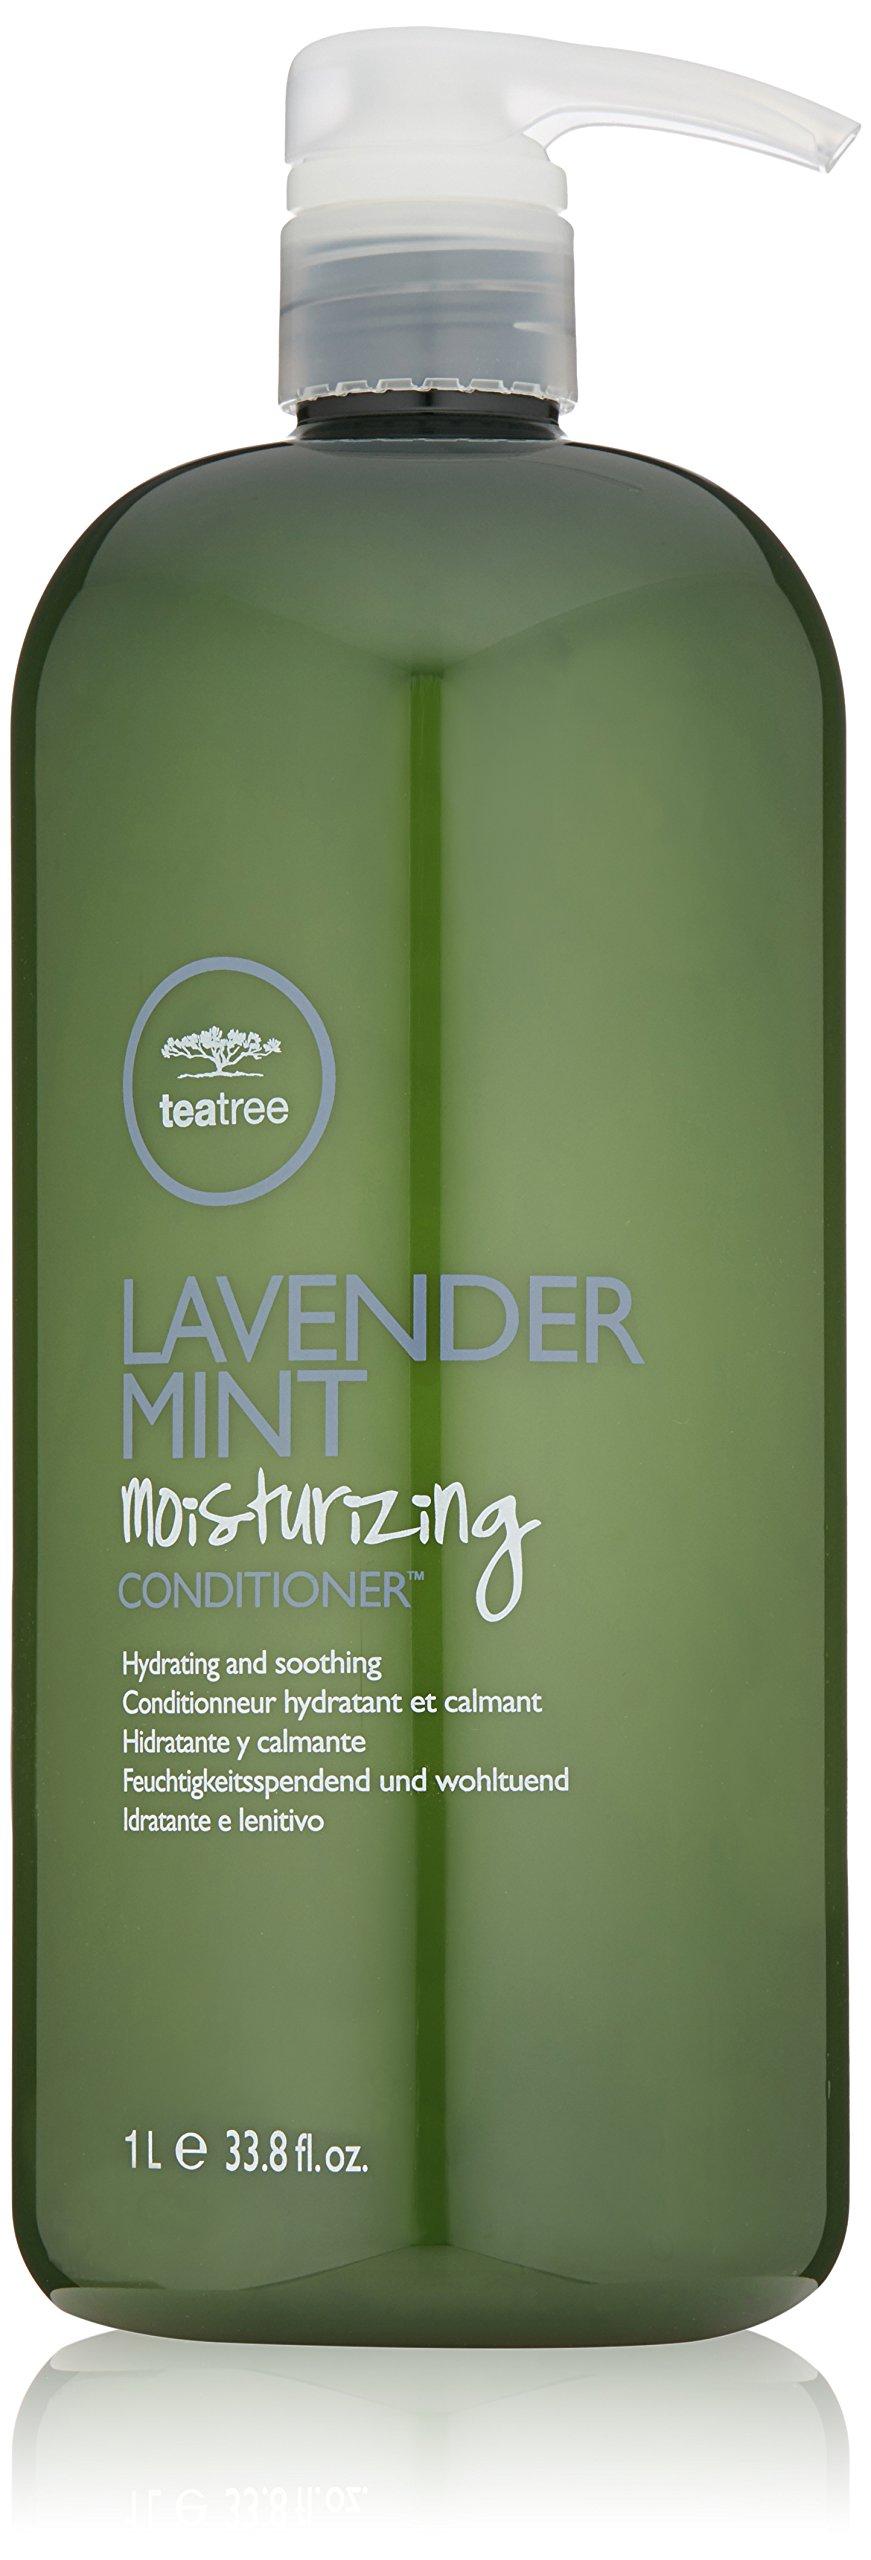 Tea Tree Lavender Mint Moisturizing Conditioner, 33.8 Fl Oz